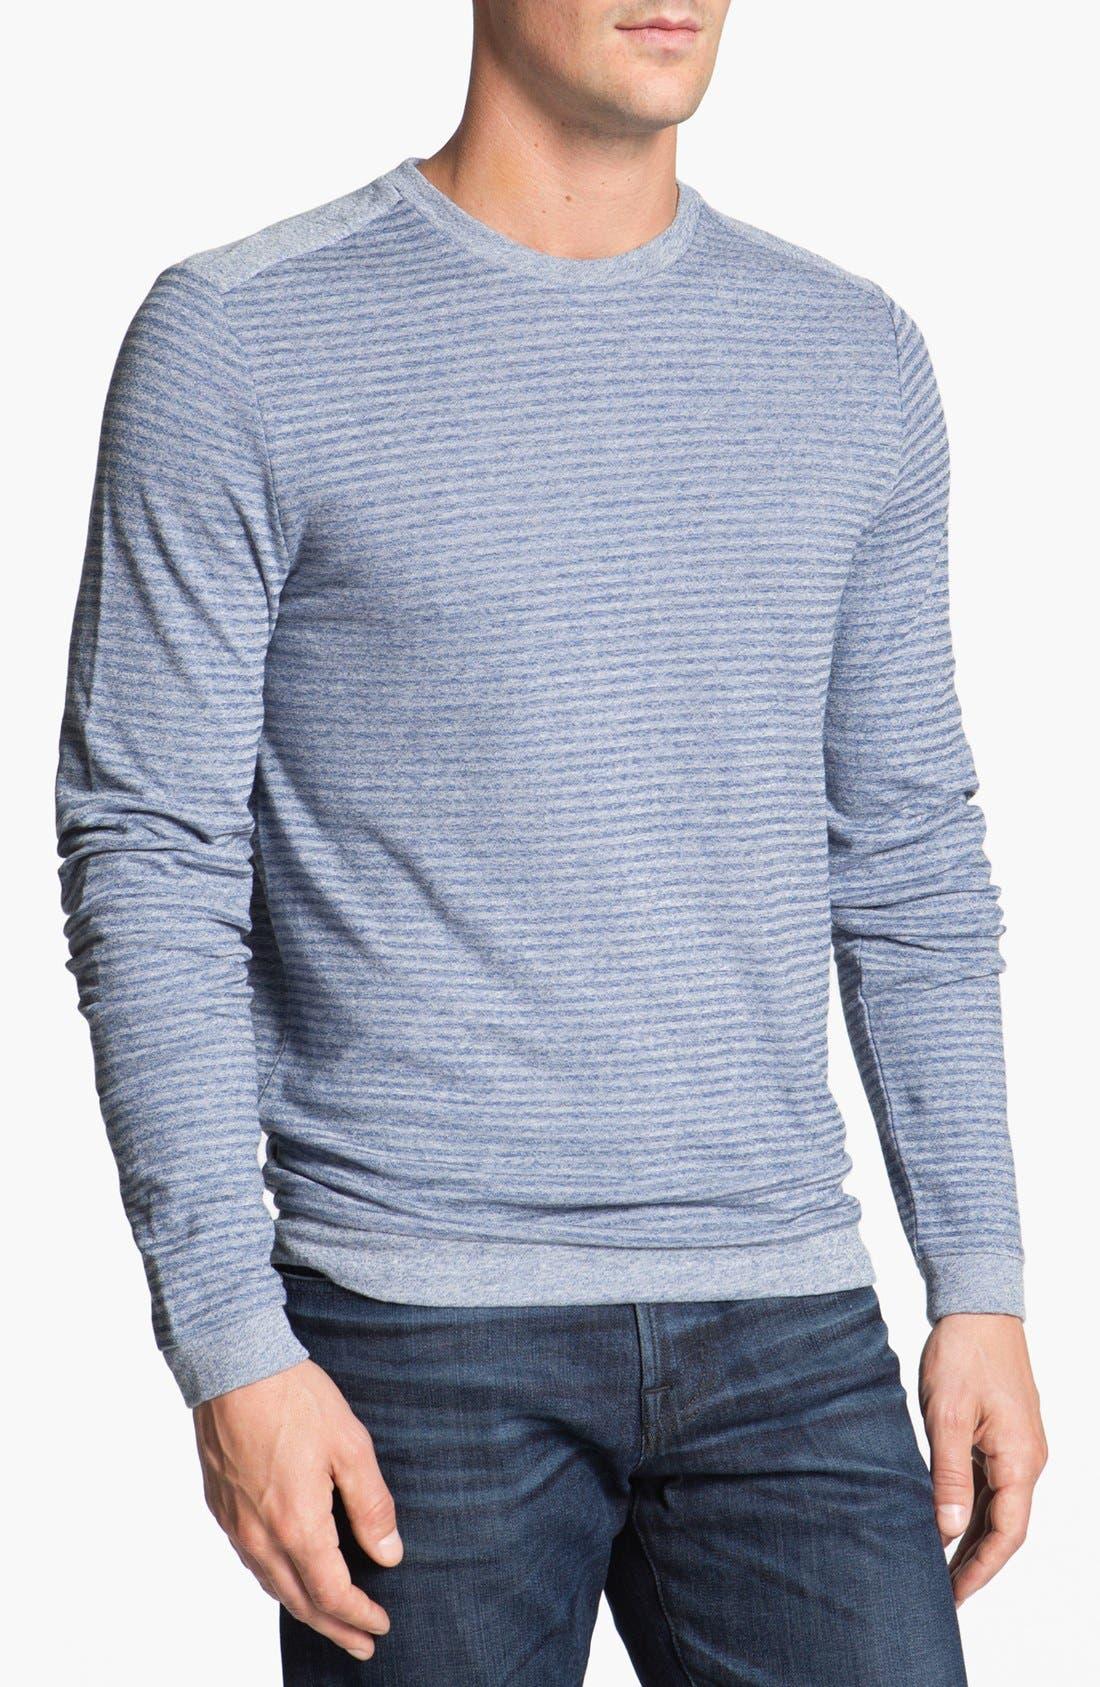 Alternate Image 1 Selected - BOSS HUGO BOSS 'Abruzzi' Slim Fit Long Sleeve T-Shirt